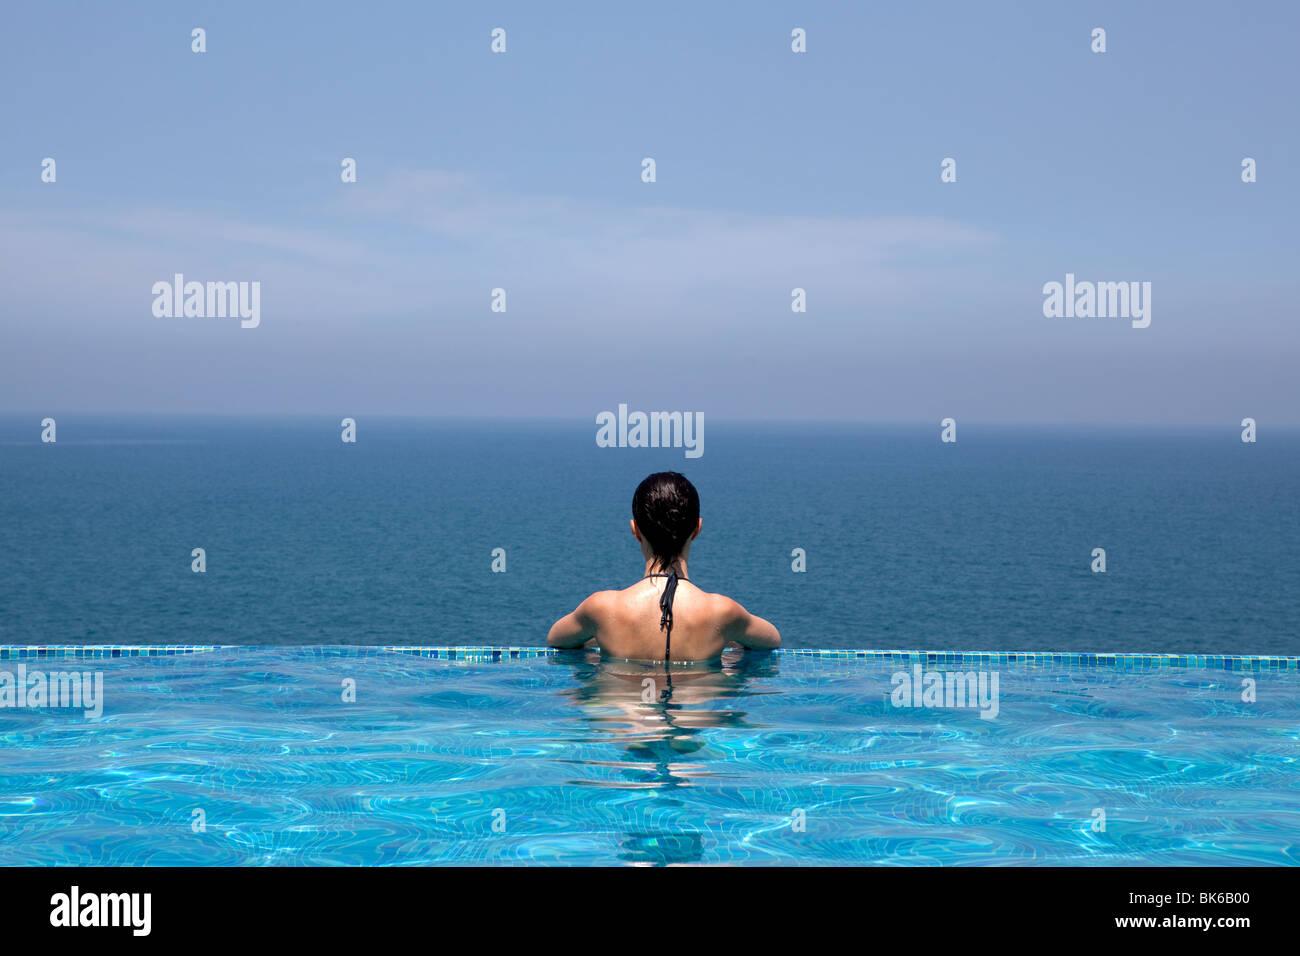 Magnifique piscine dans un hôtel resort de l'état du Kerala indi Photo Stock